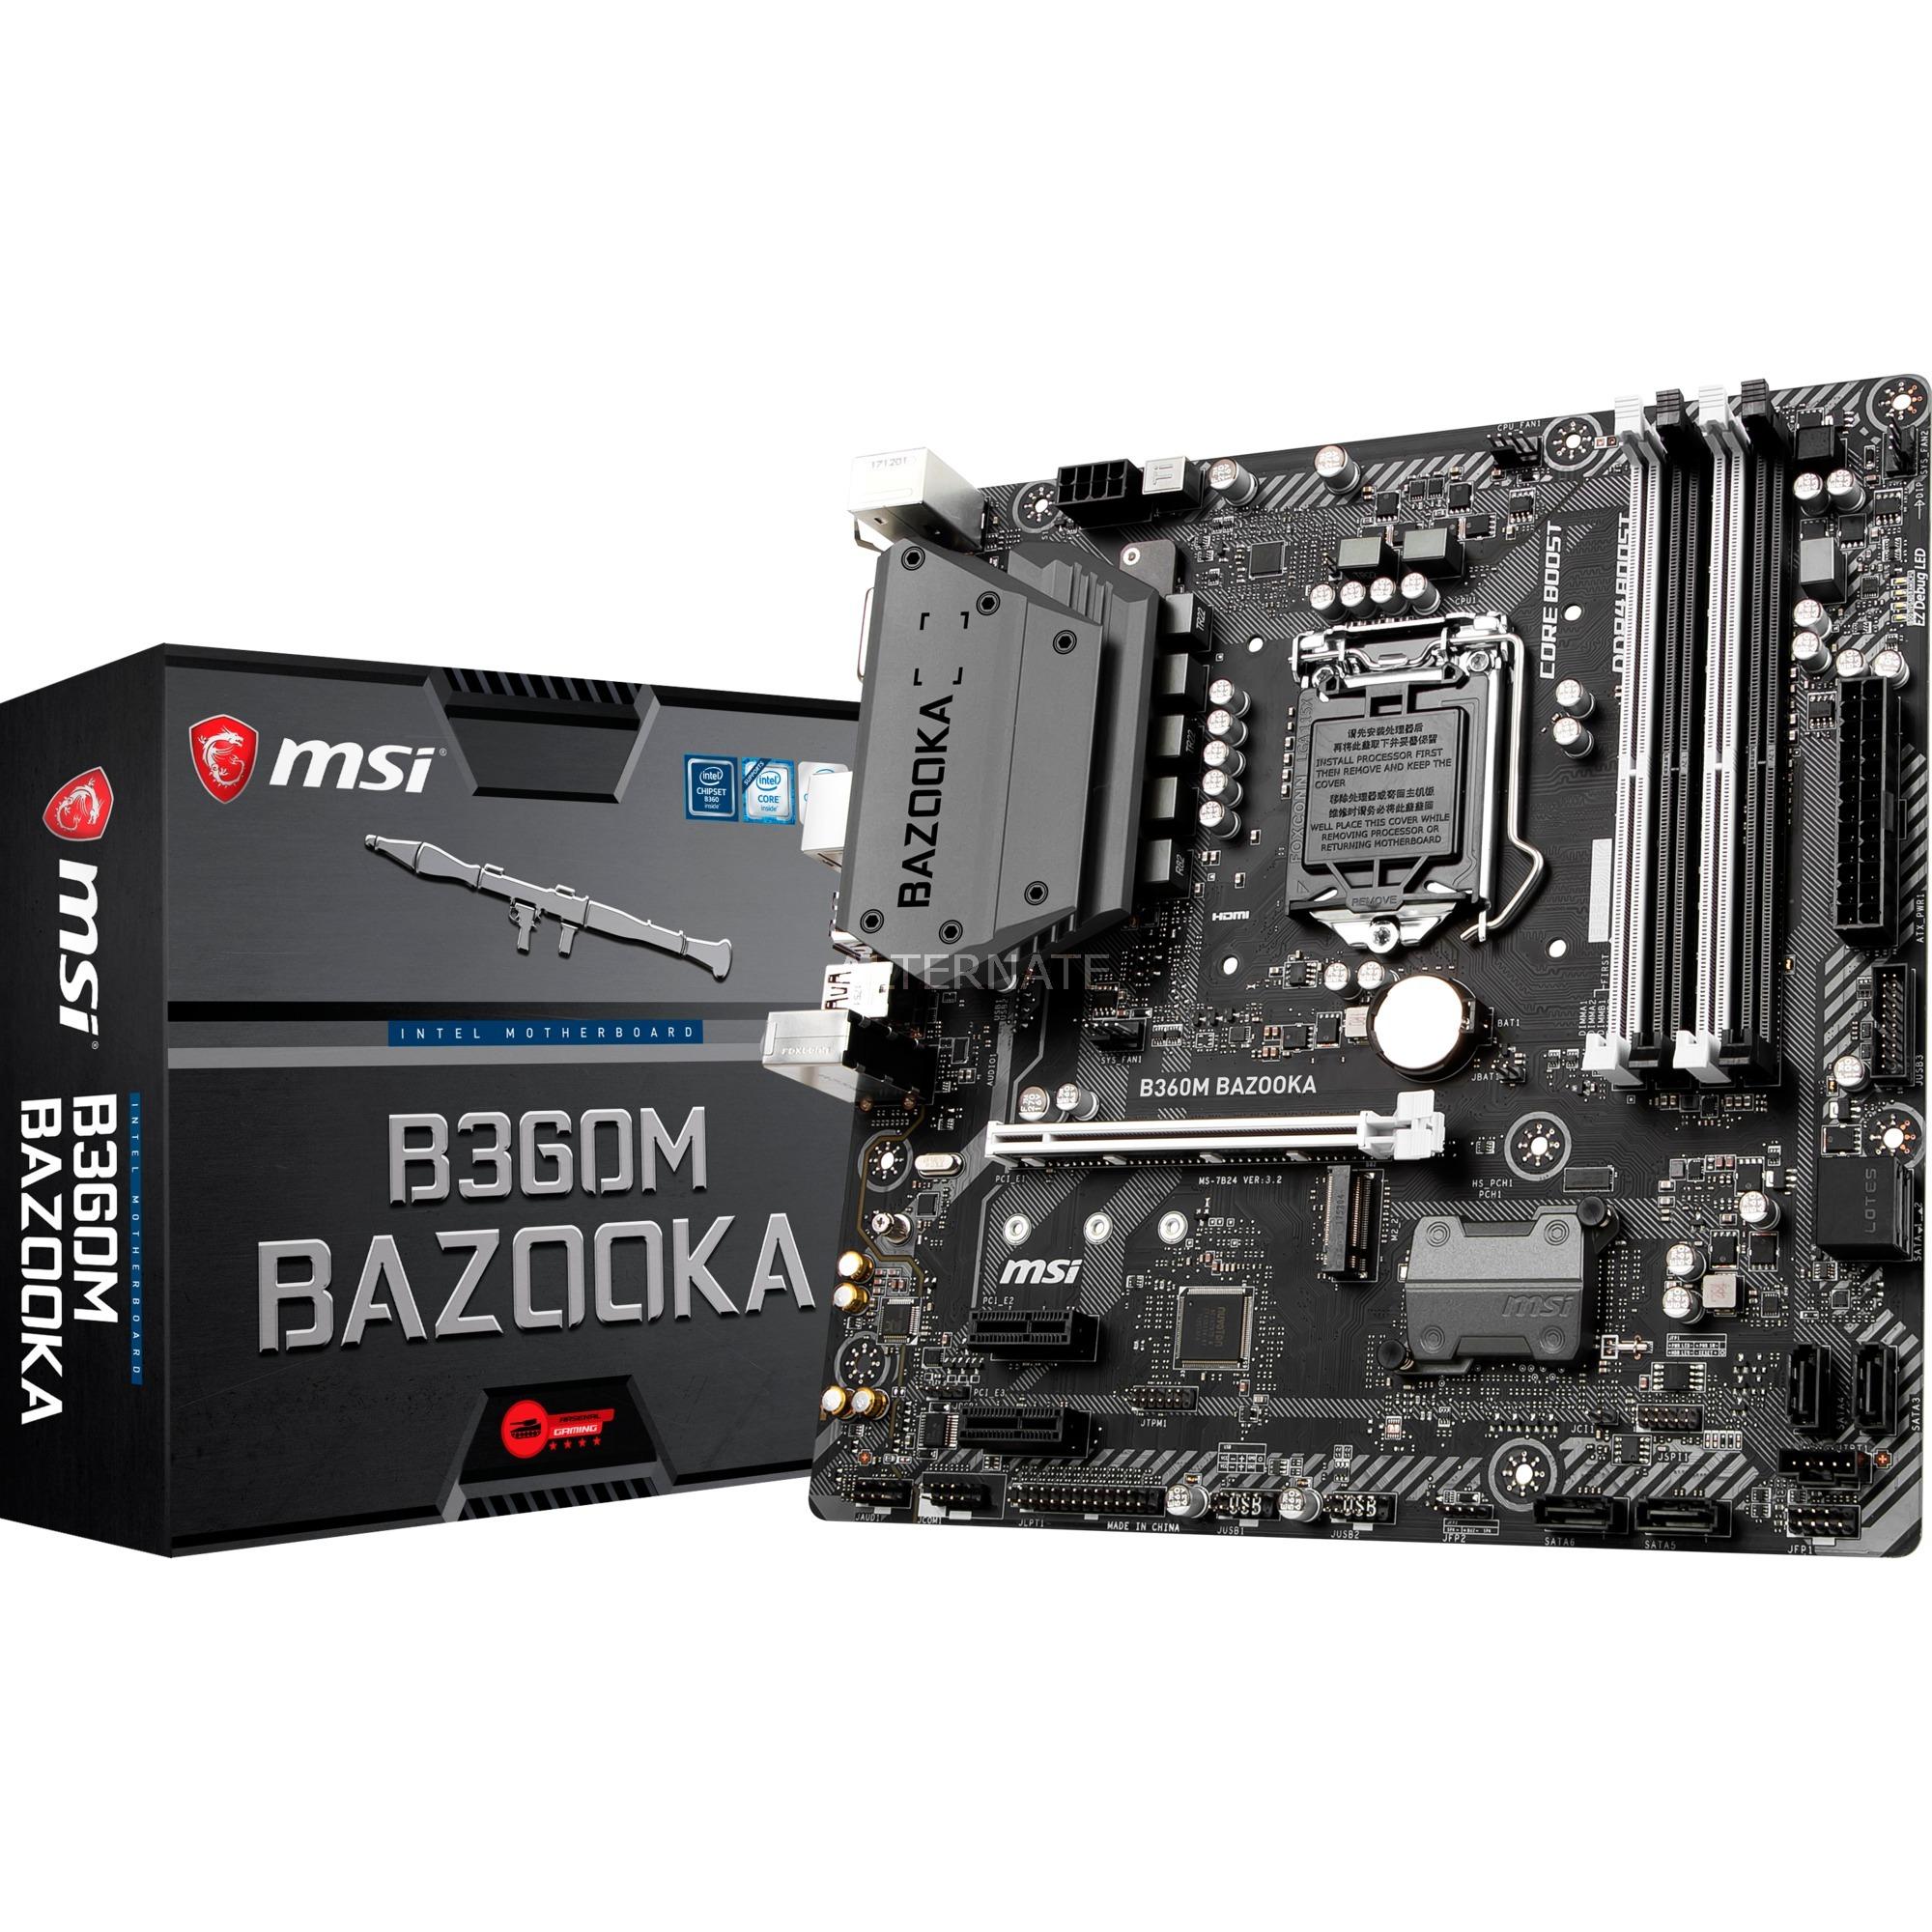 B360M BAZOOKA placa base LGA 1151 (Zócalo H4) Micro ATX Intel B360